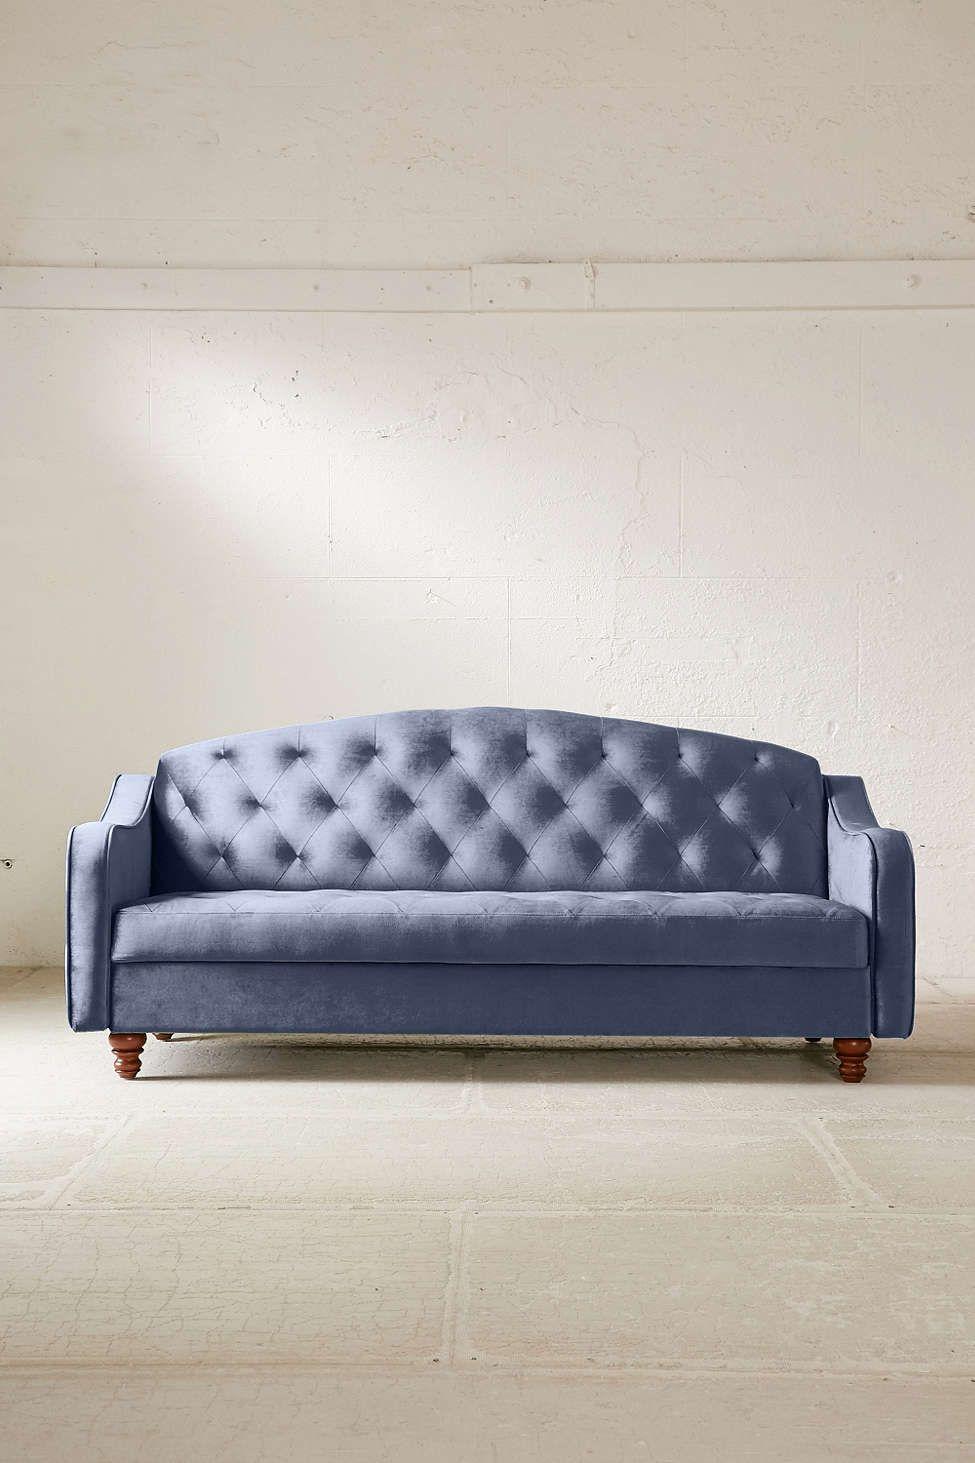 space furniture sale. ava storage sleeper sofa apartment furniturespace space furniture sale